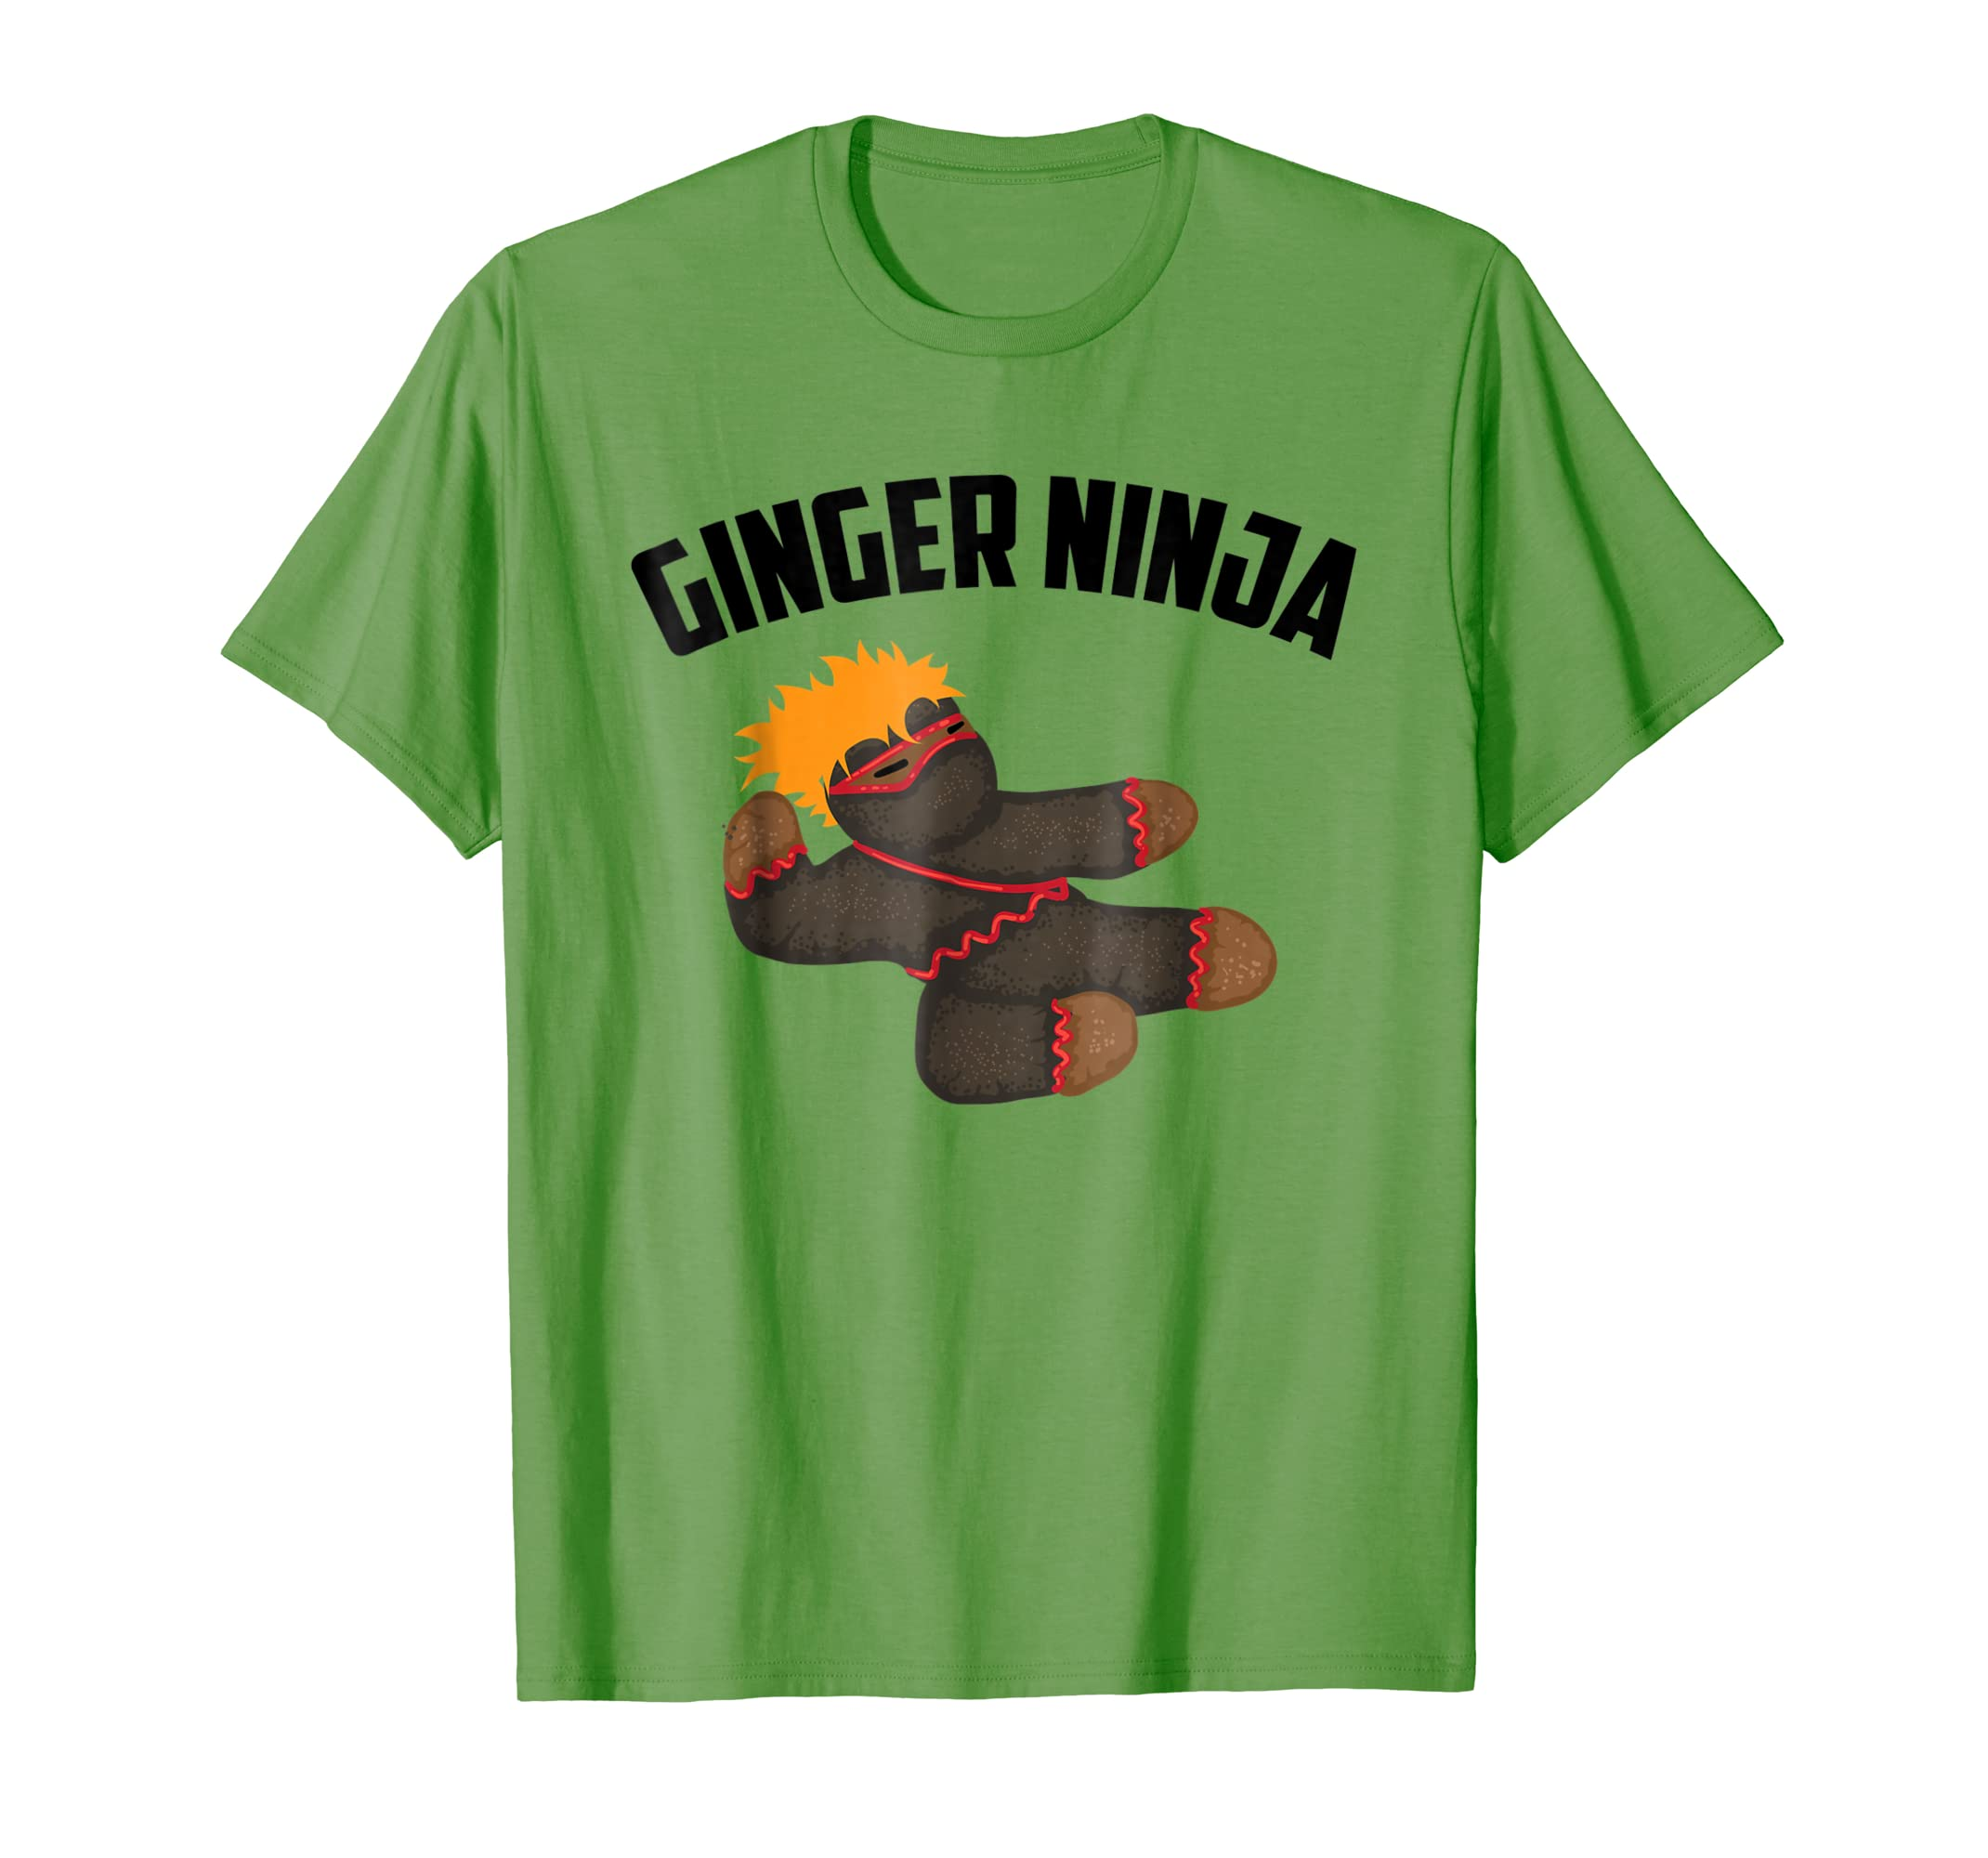 Amazon.com: Ginger Ninja Shirt | Cute Red And Orange Ninja ...